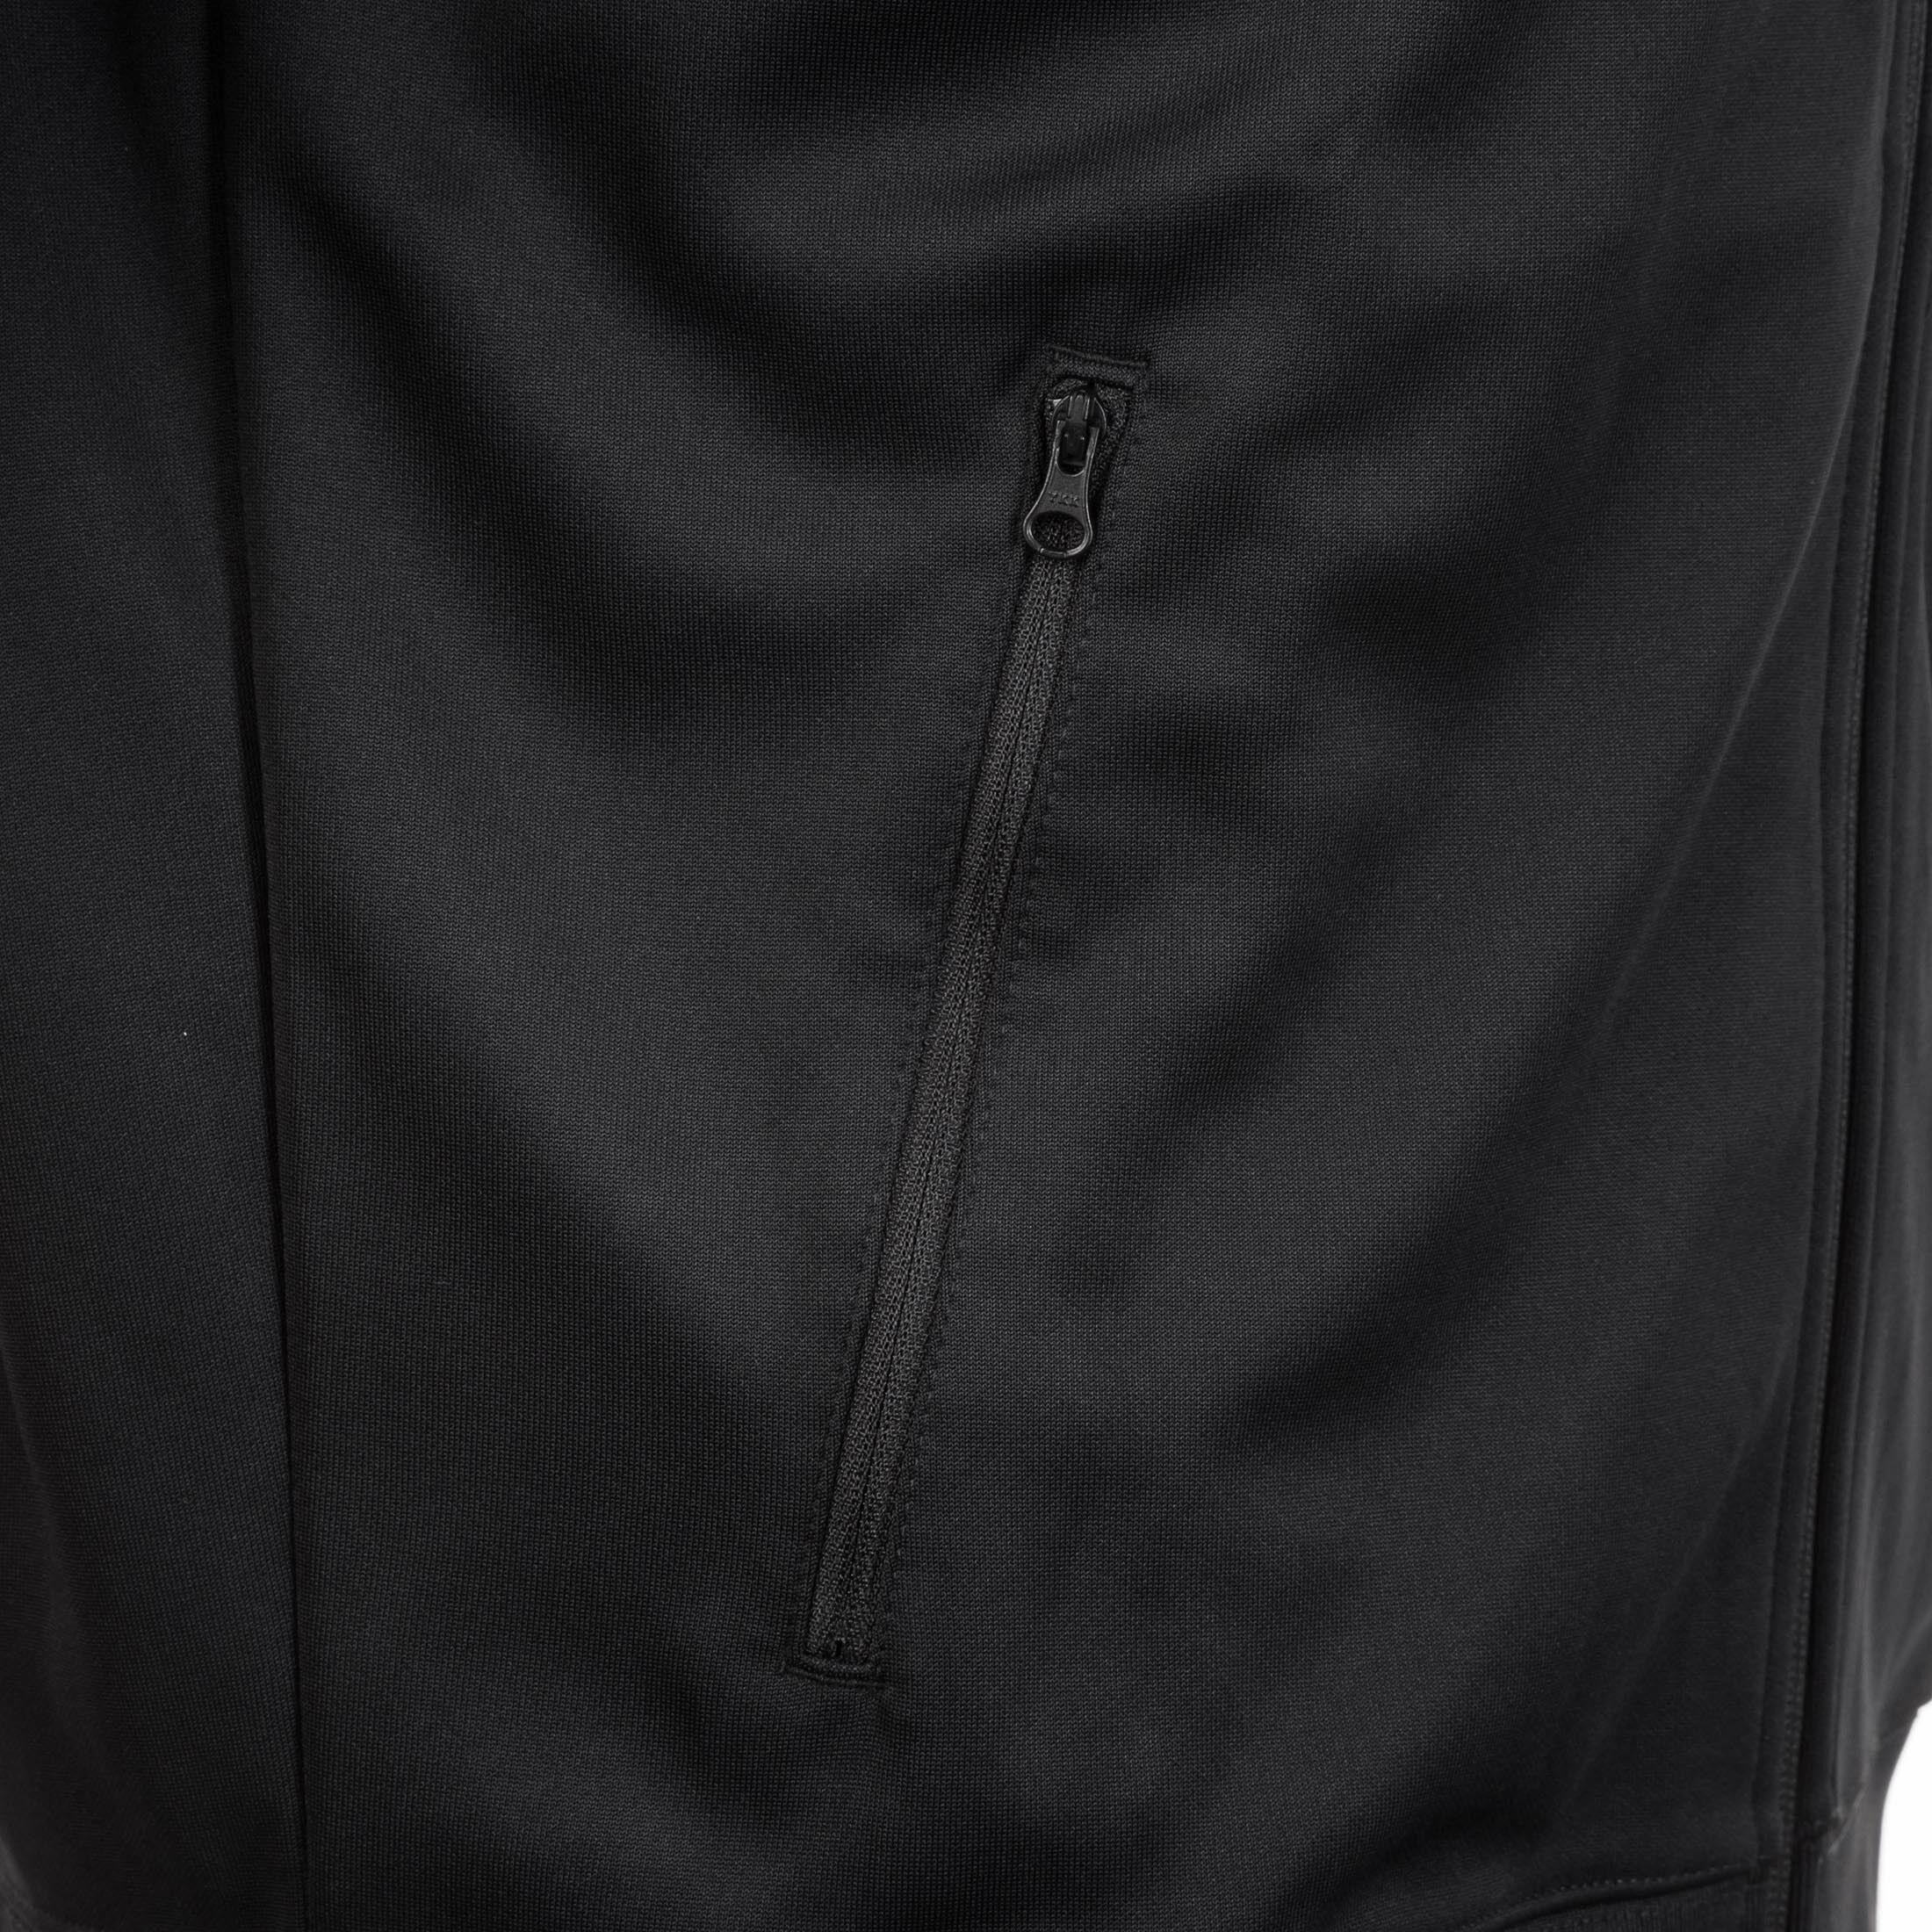 Details zu Nike Sportswear Tribute Jacket Kapuzenjacke Herren weiß schwarz rot Freizeit NEU